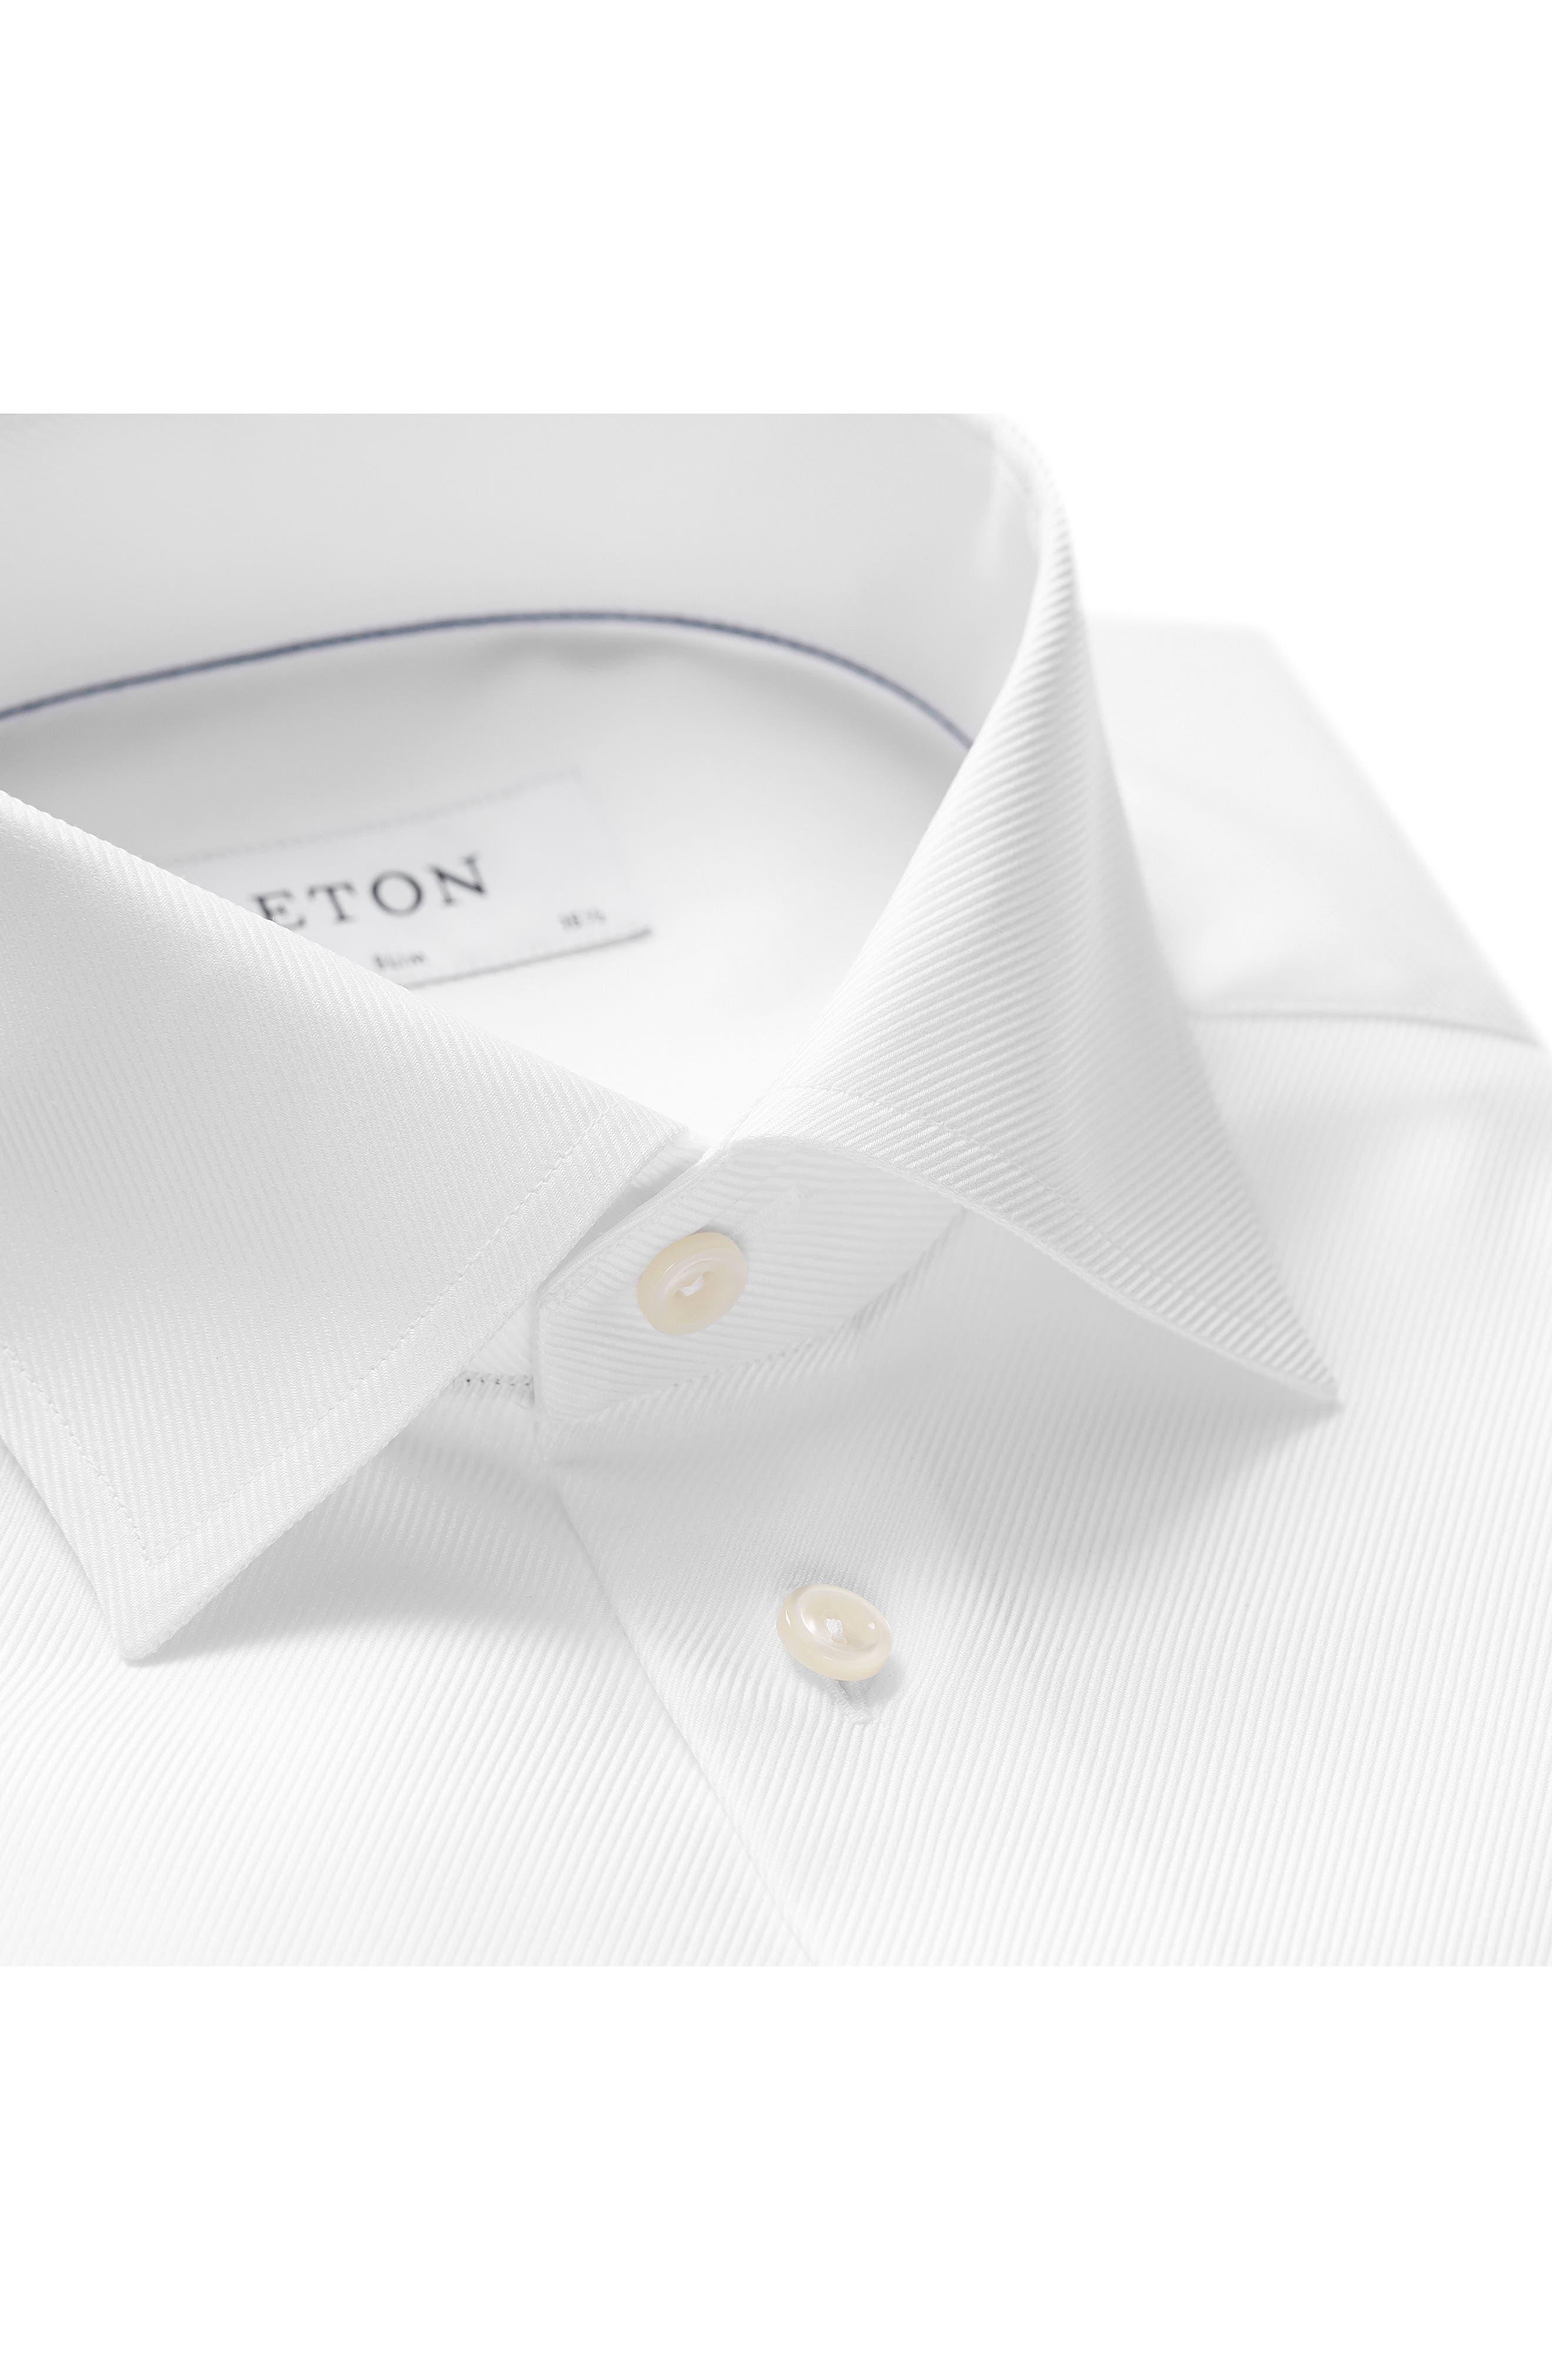 Slim Fit Cavalry Twill Dress Shirt,                             Alternate thumbnail 2, color,                             White